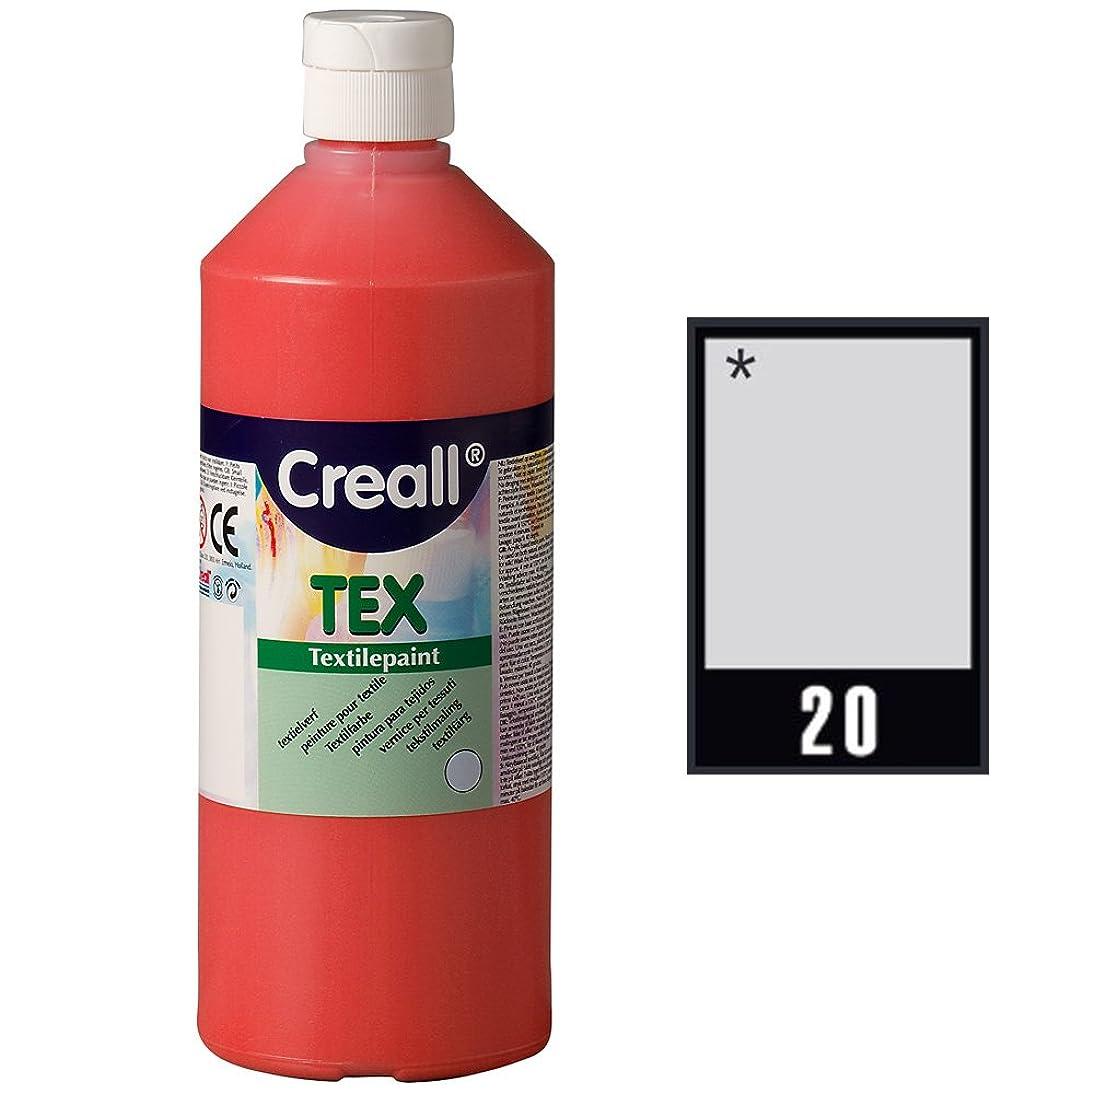 Creall Havo24040 250 ml 20 Silver Havo Textile Paint Bottle